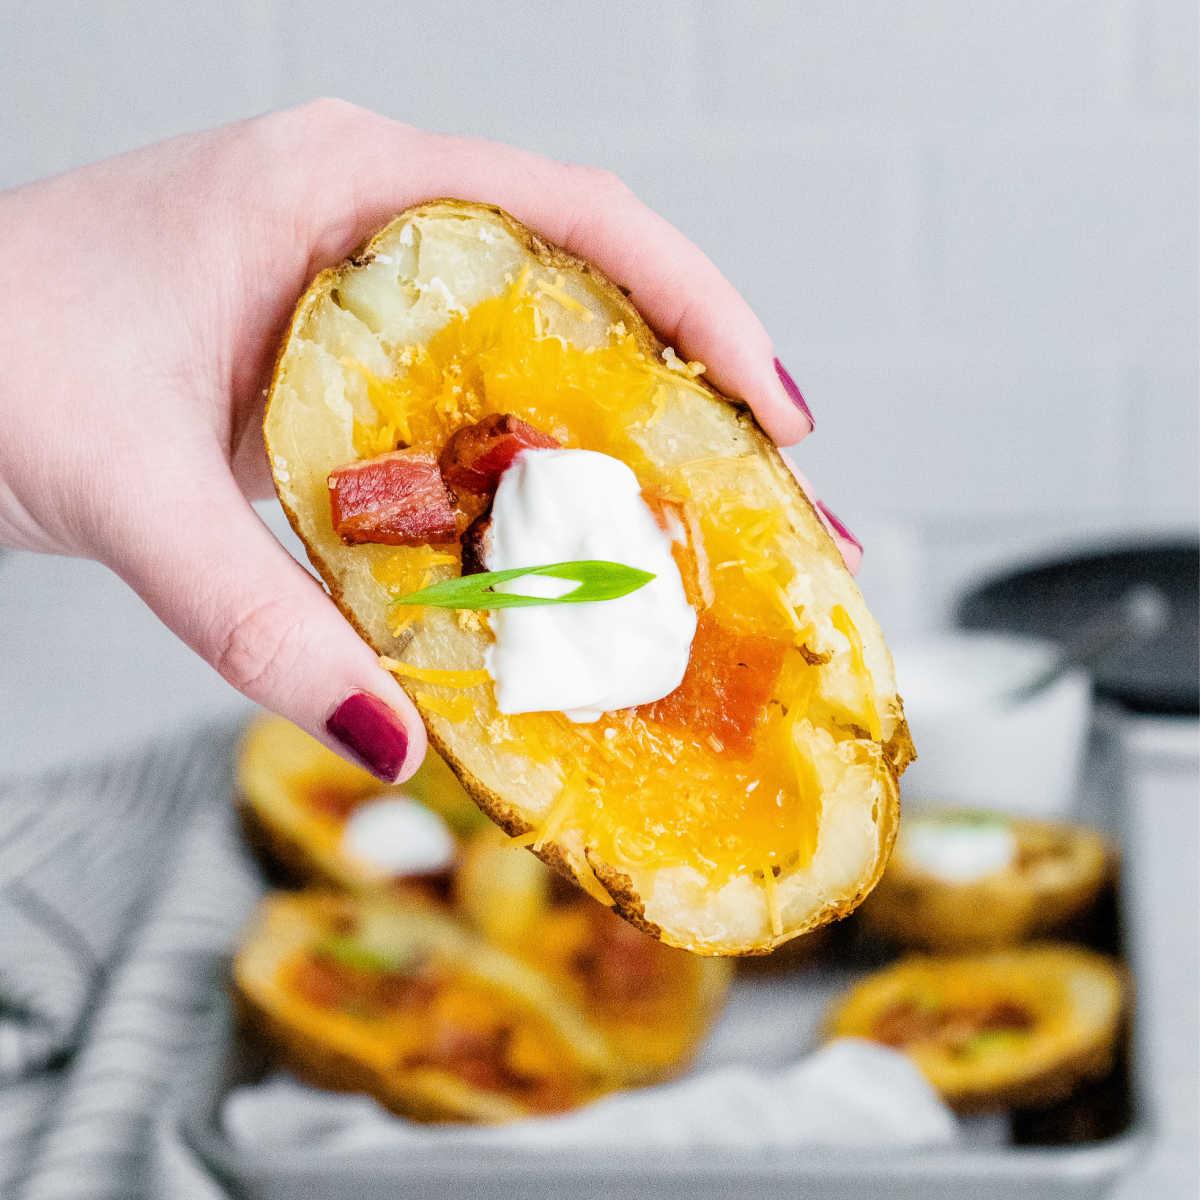 A hand holding a potato skin.